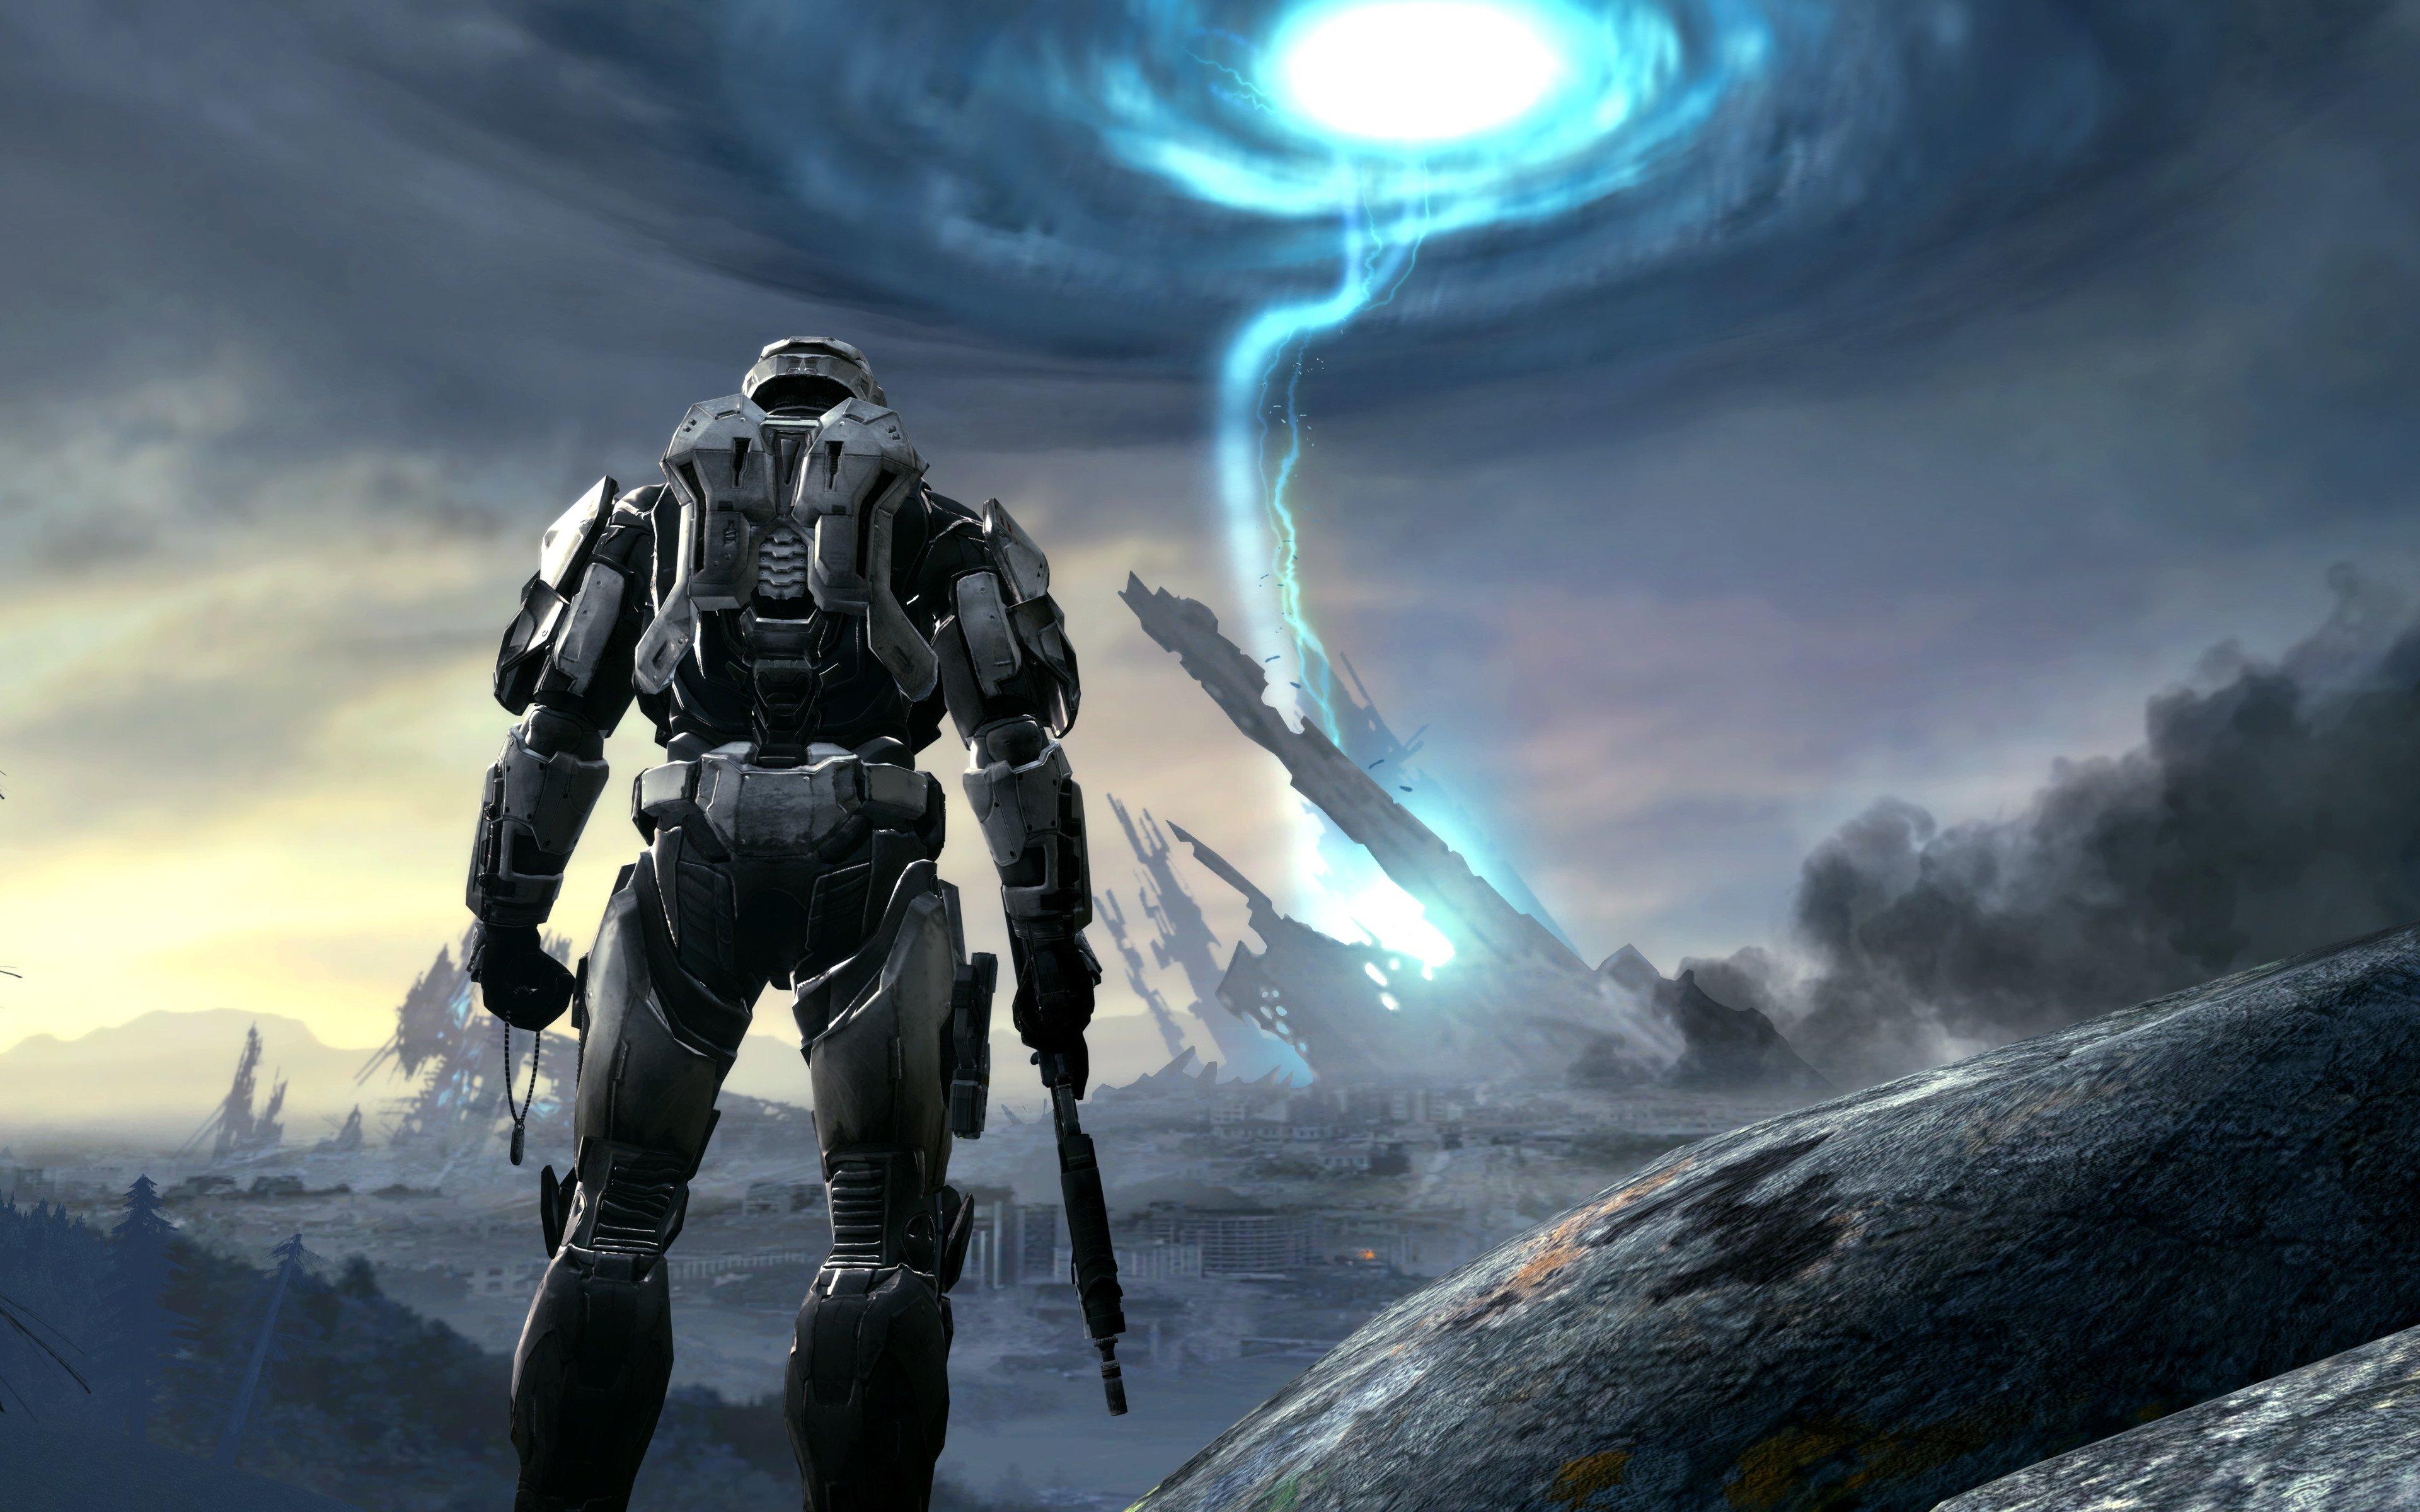 Fondos de pantalla Juego Halo Artwork